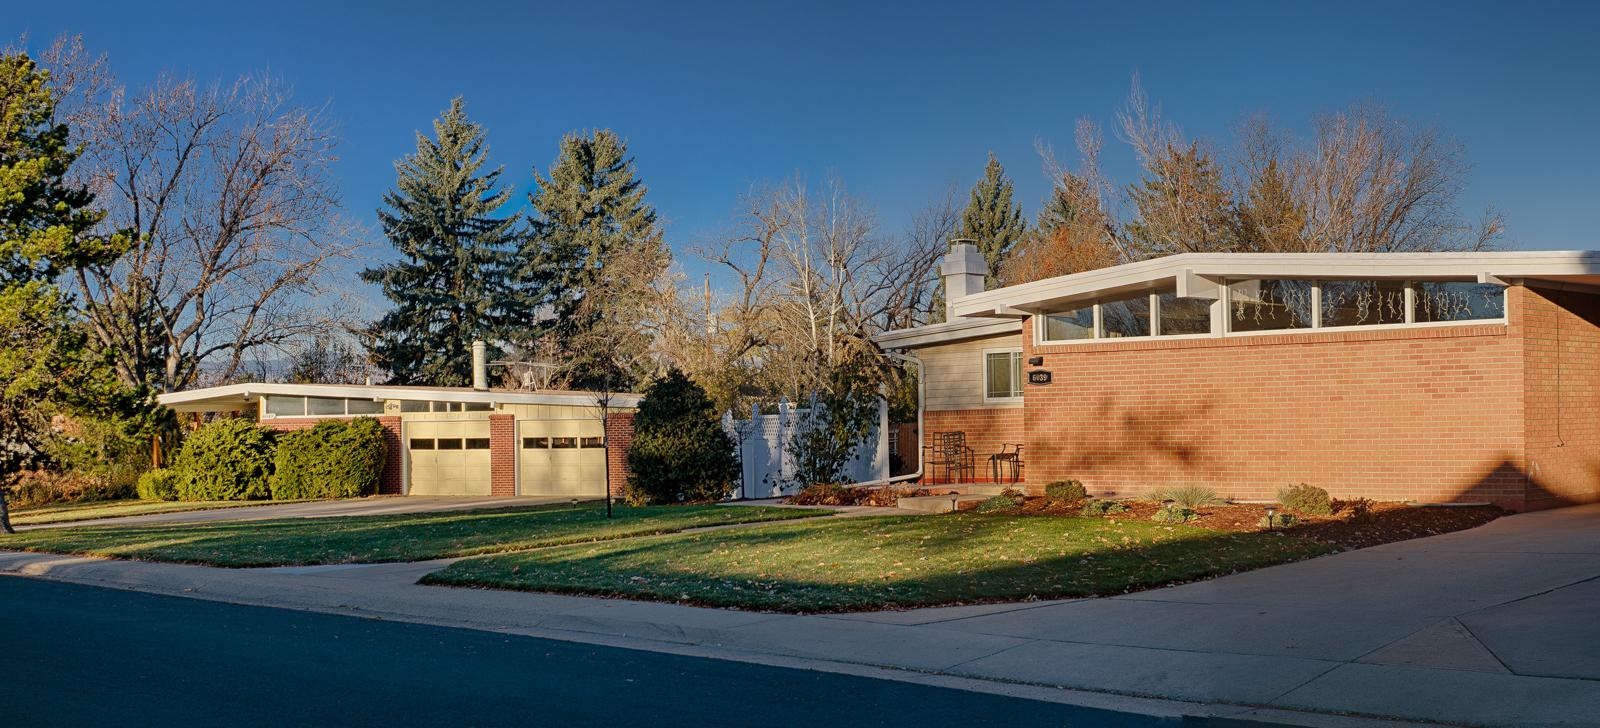 Adrian-Kinney-Dream-House-Acres-8.jpg